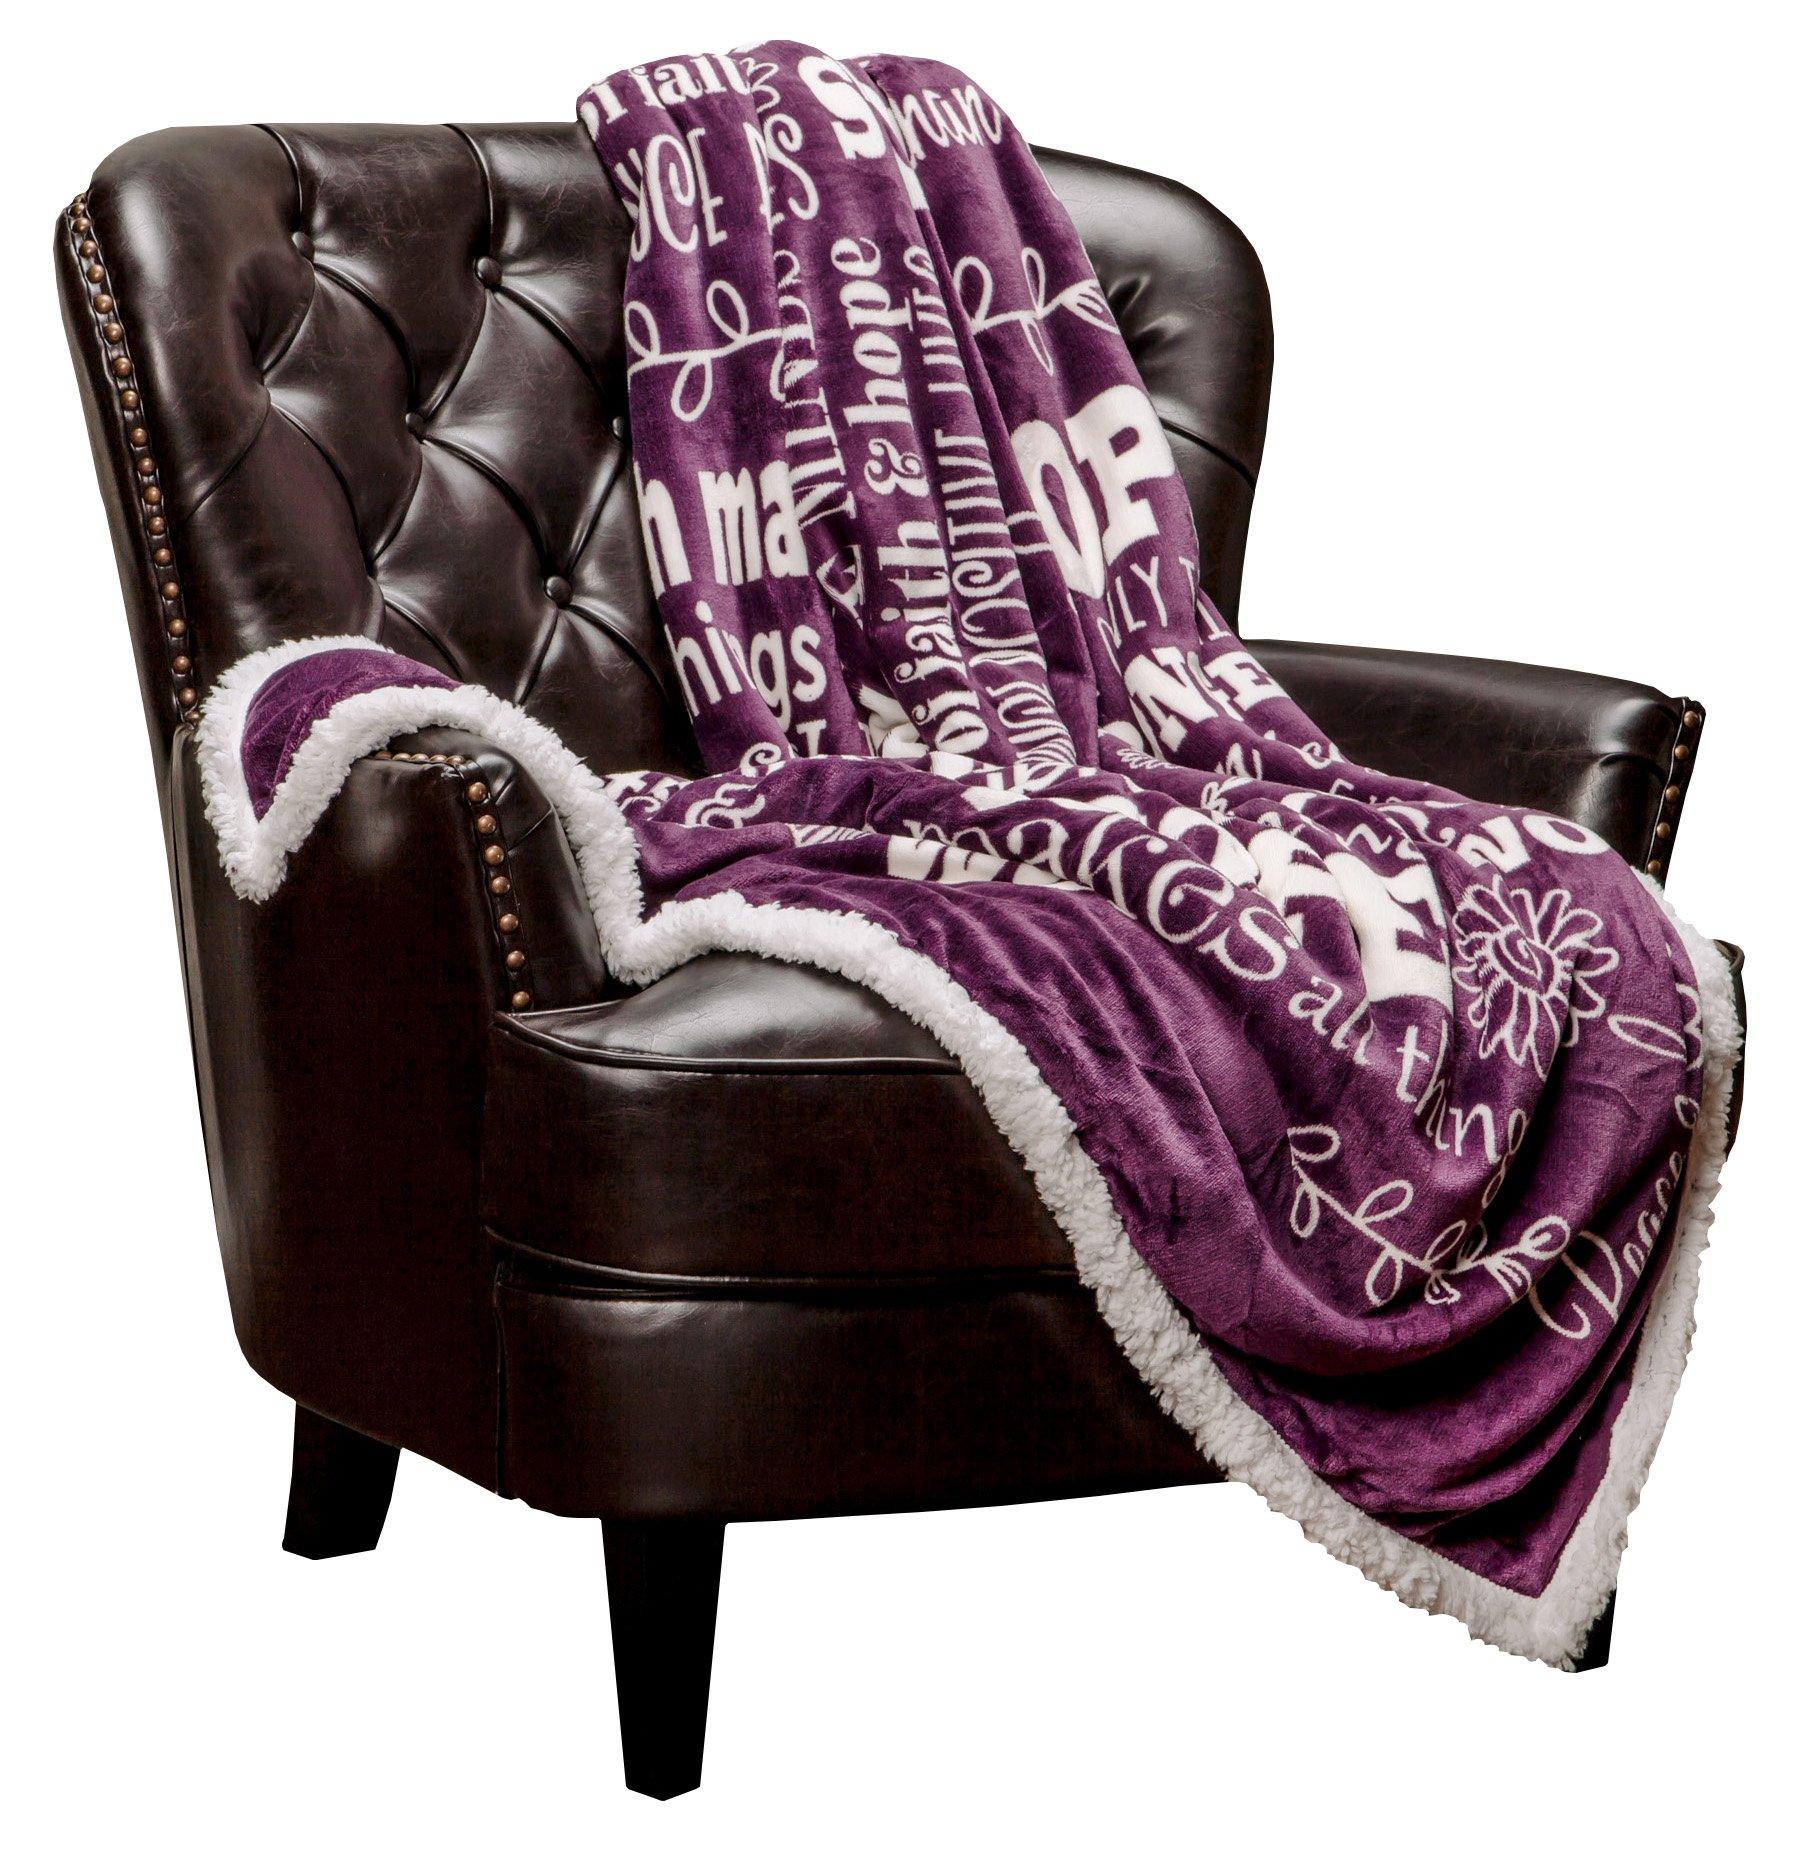 Chanasya Super Soft Ultra Plush Powerful Hope and Faith inspirational Messages Posivite Energy Comfort Caring Uplifting Gift Teal Blue Microfiber Throw Blanket (50'' x 65'') (50'' x 65'', Dark Purple)